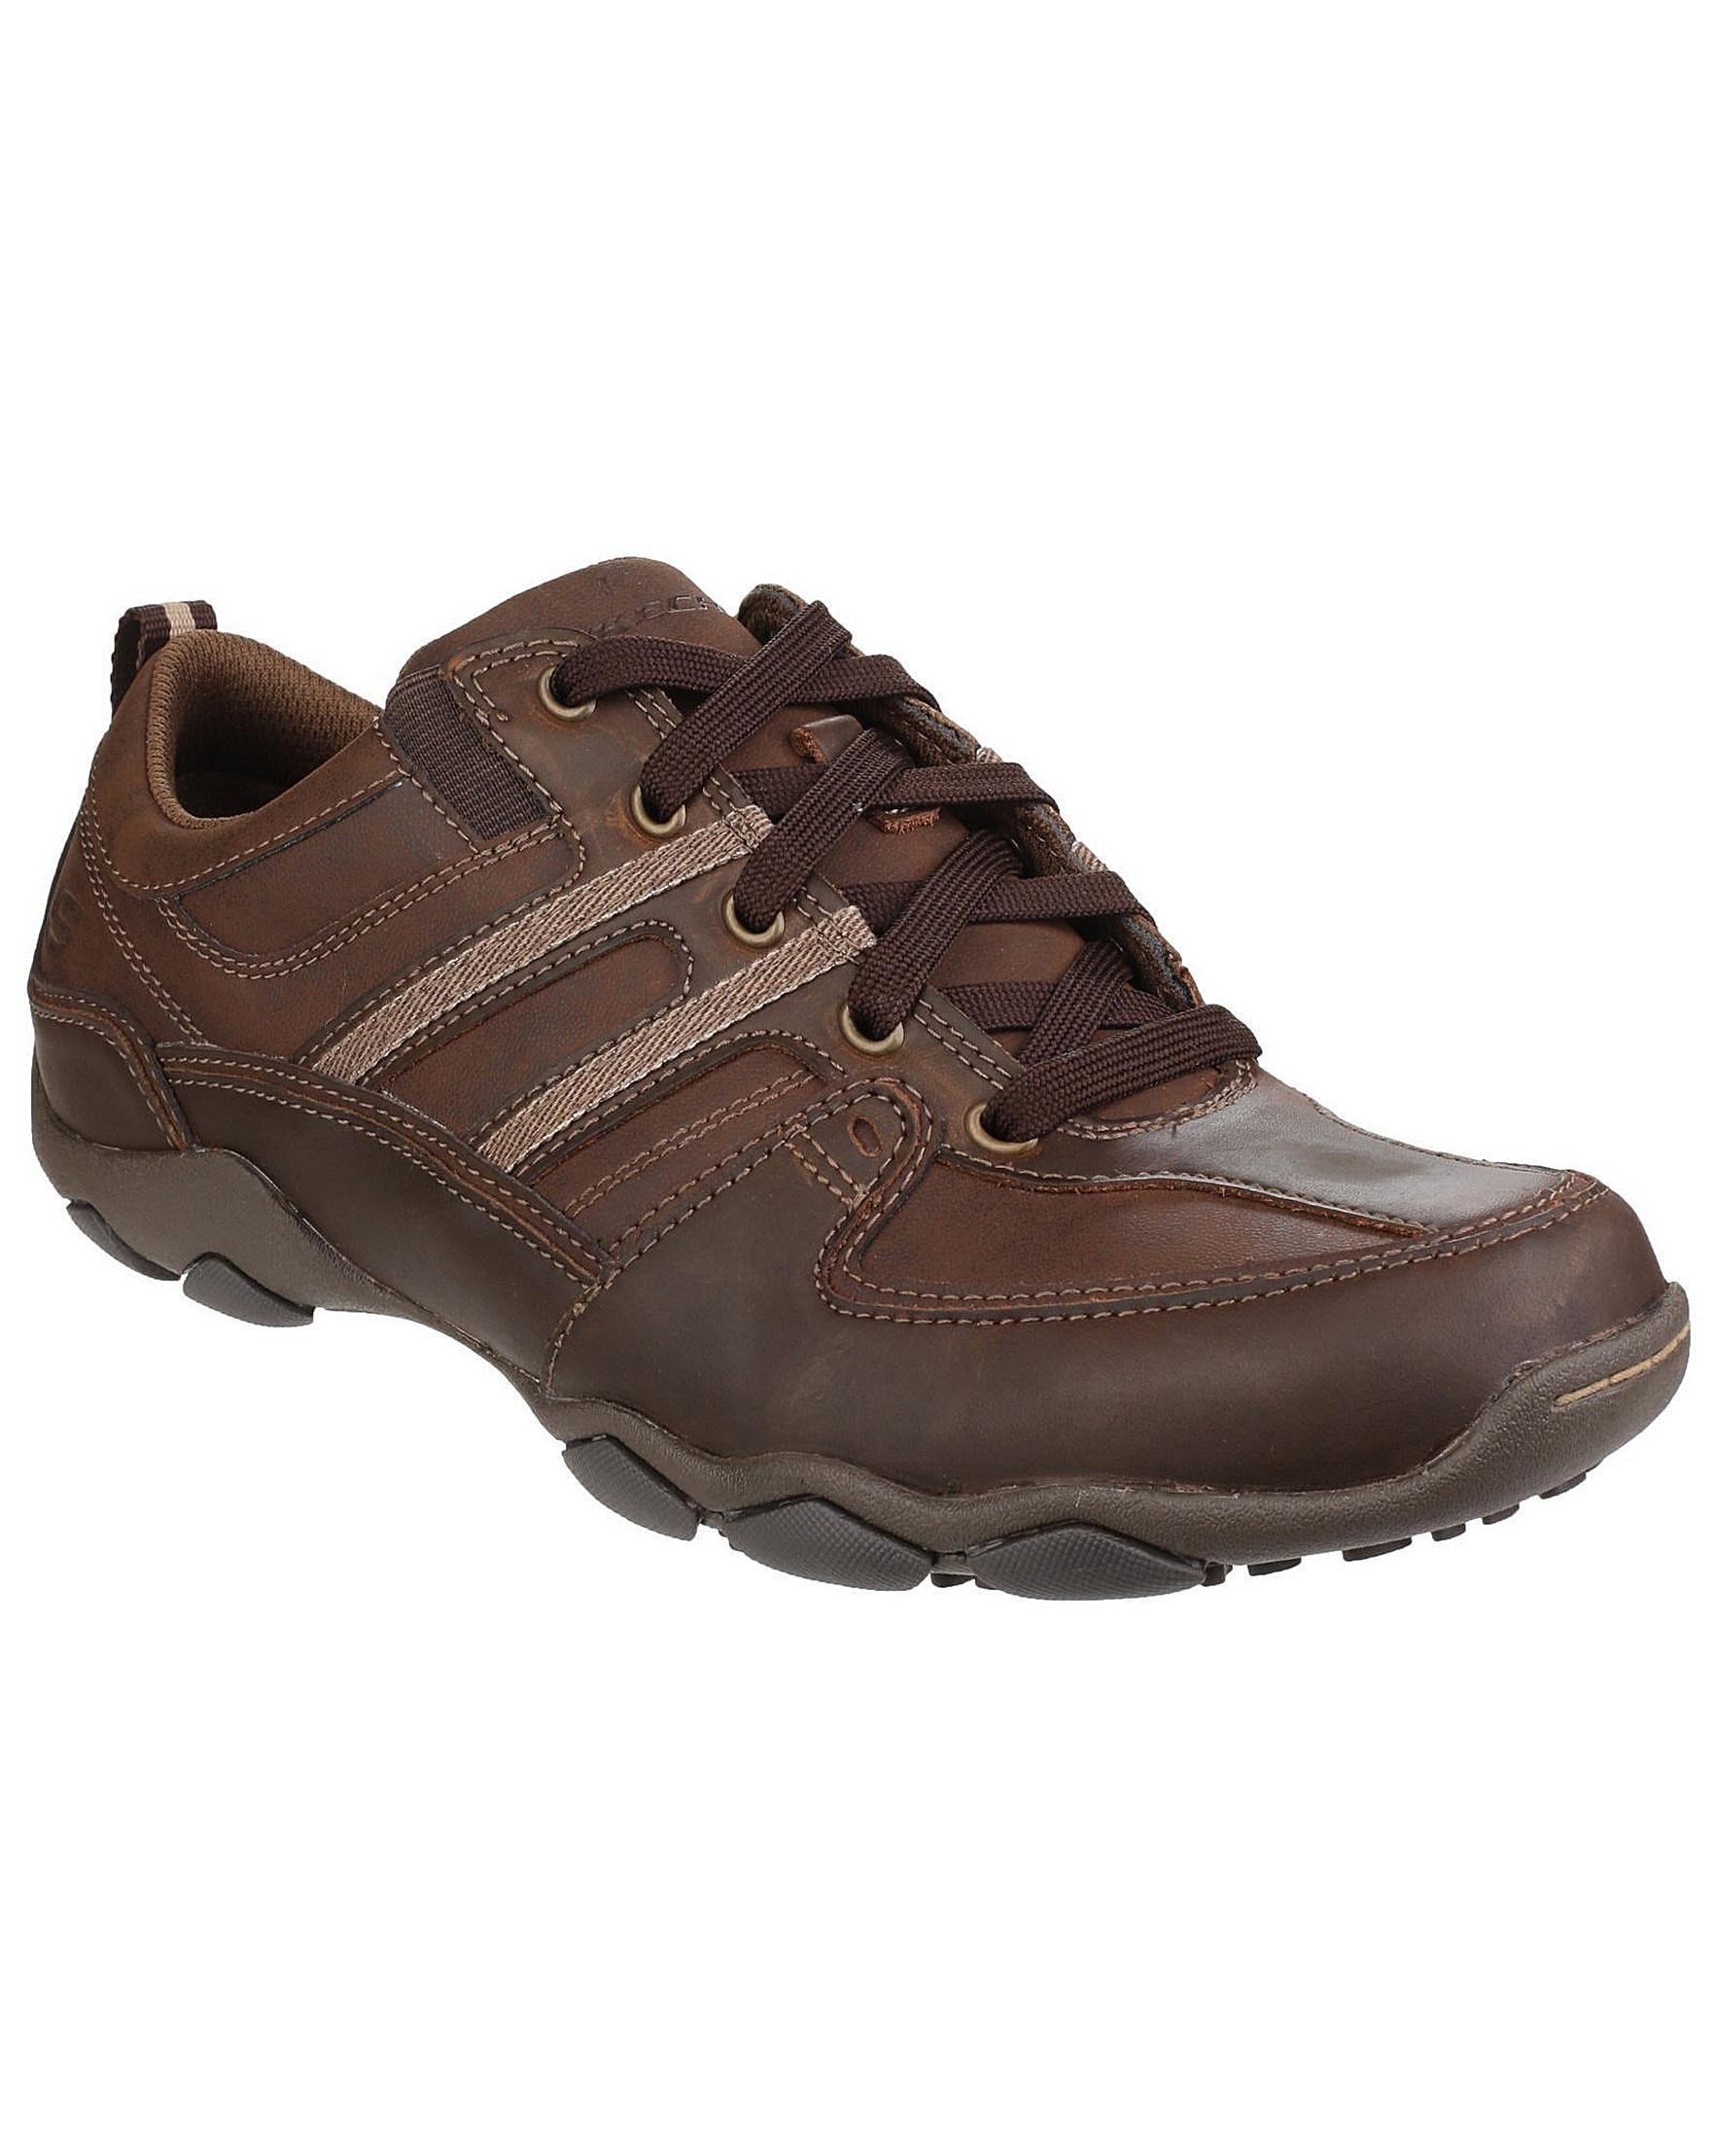 af86c7153e1f Skechers Diameter Selent Lace Up Shoe in Brown for Men - Lyst